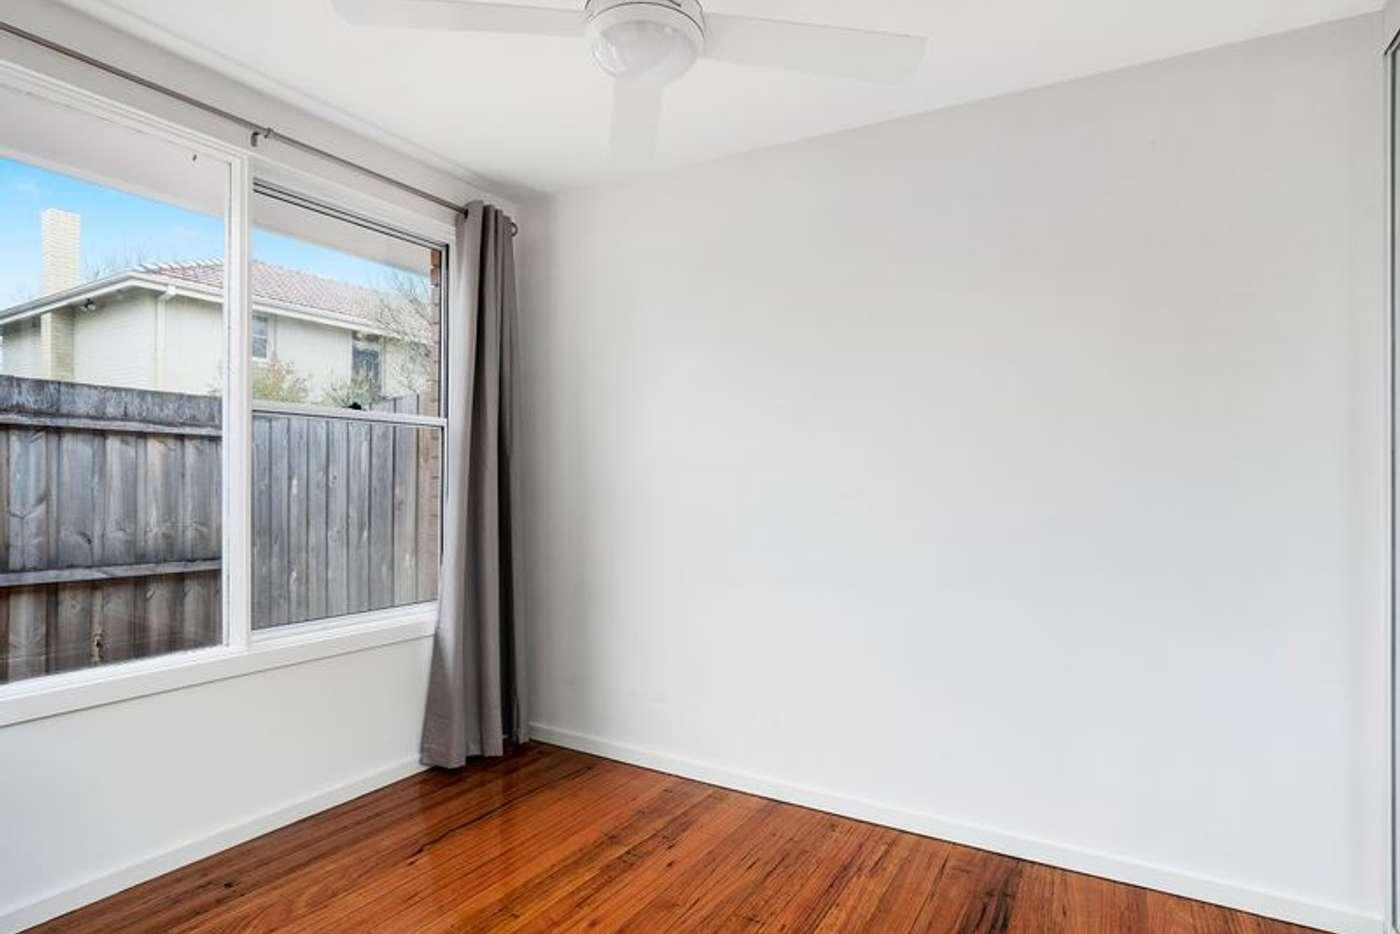 Seventh view of Homely unit listing, 5/104 Keon Street, Thornbury VIC 3071